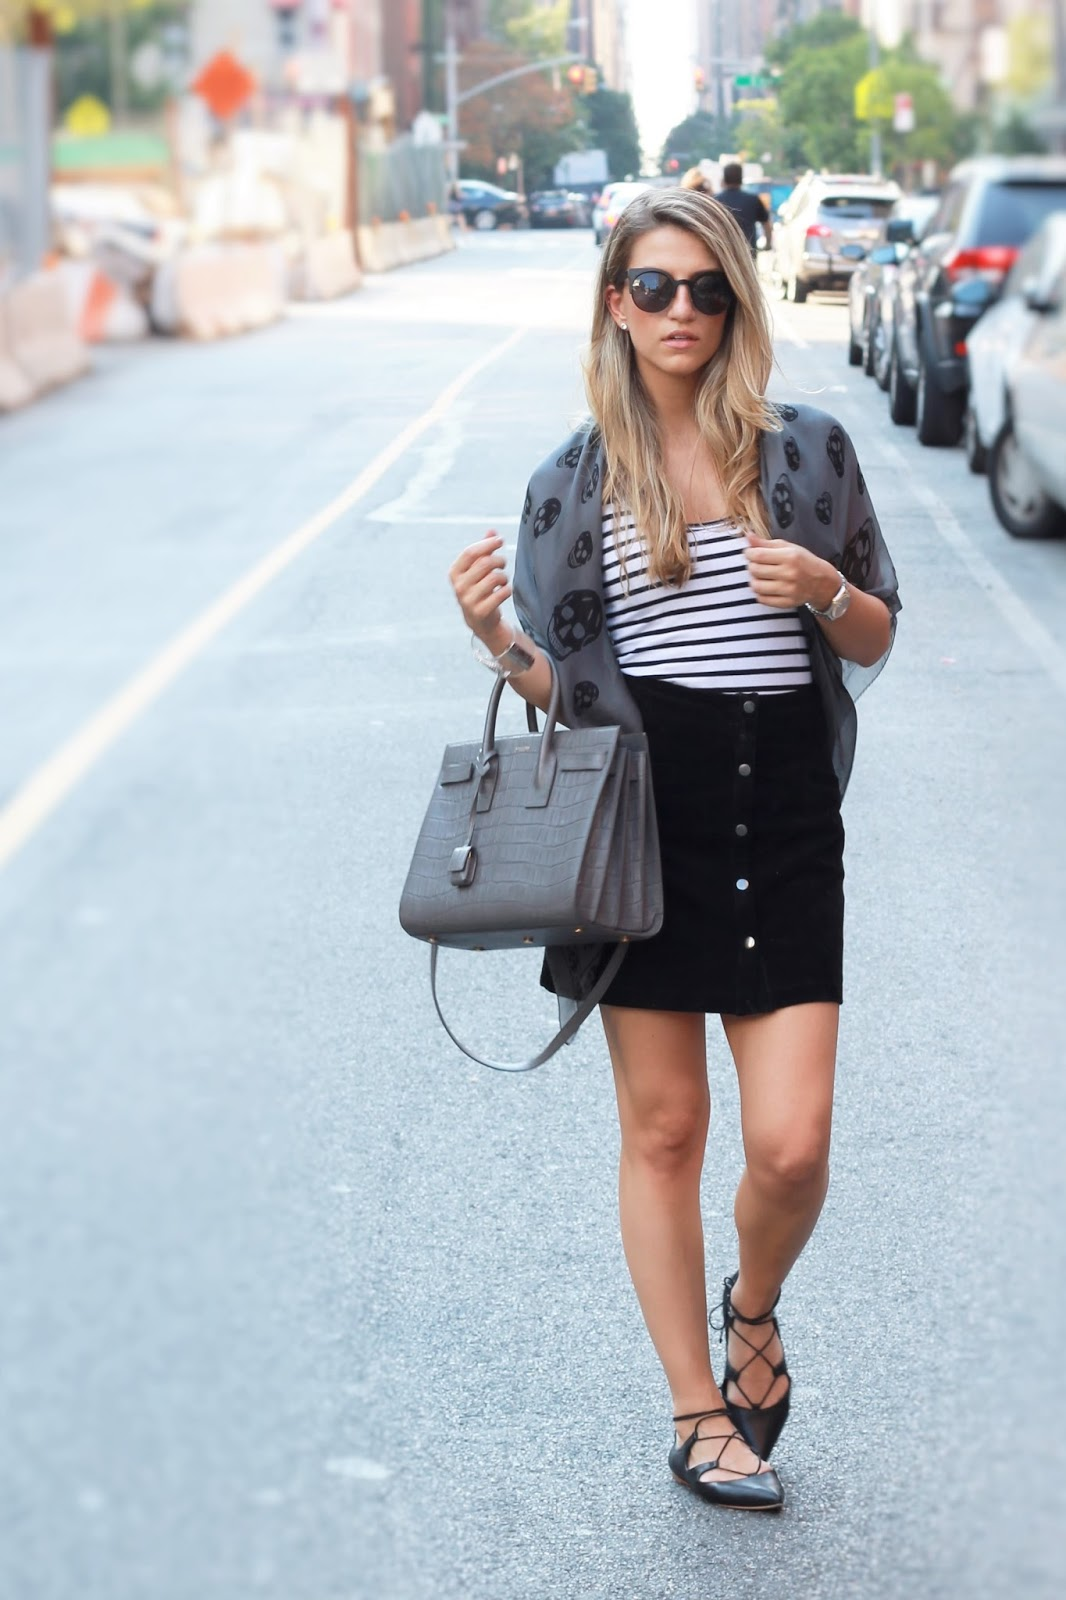 loeffler randall ambra flats, lace up flat outfit ideas